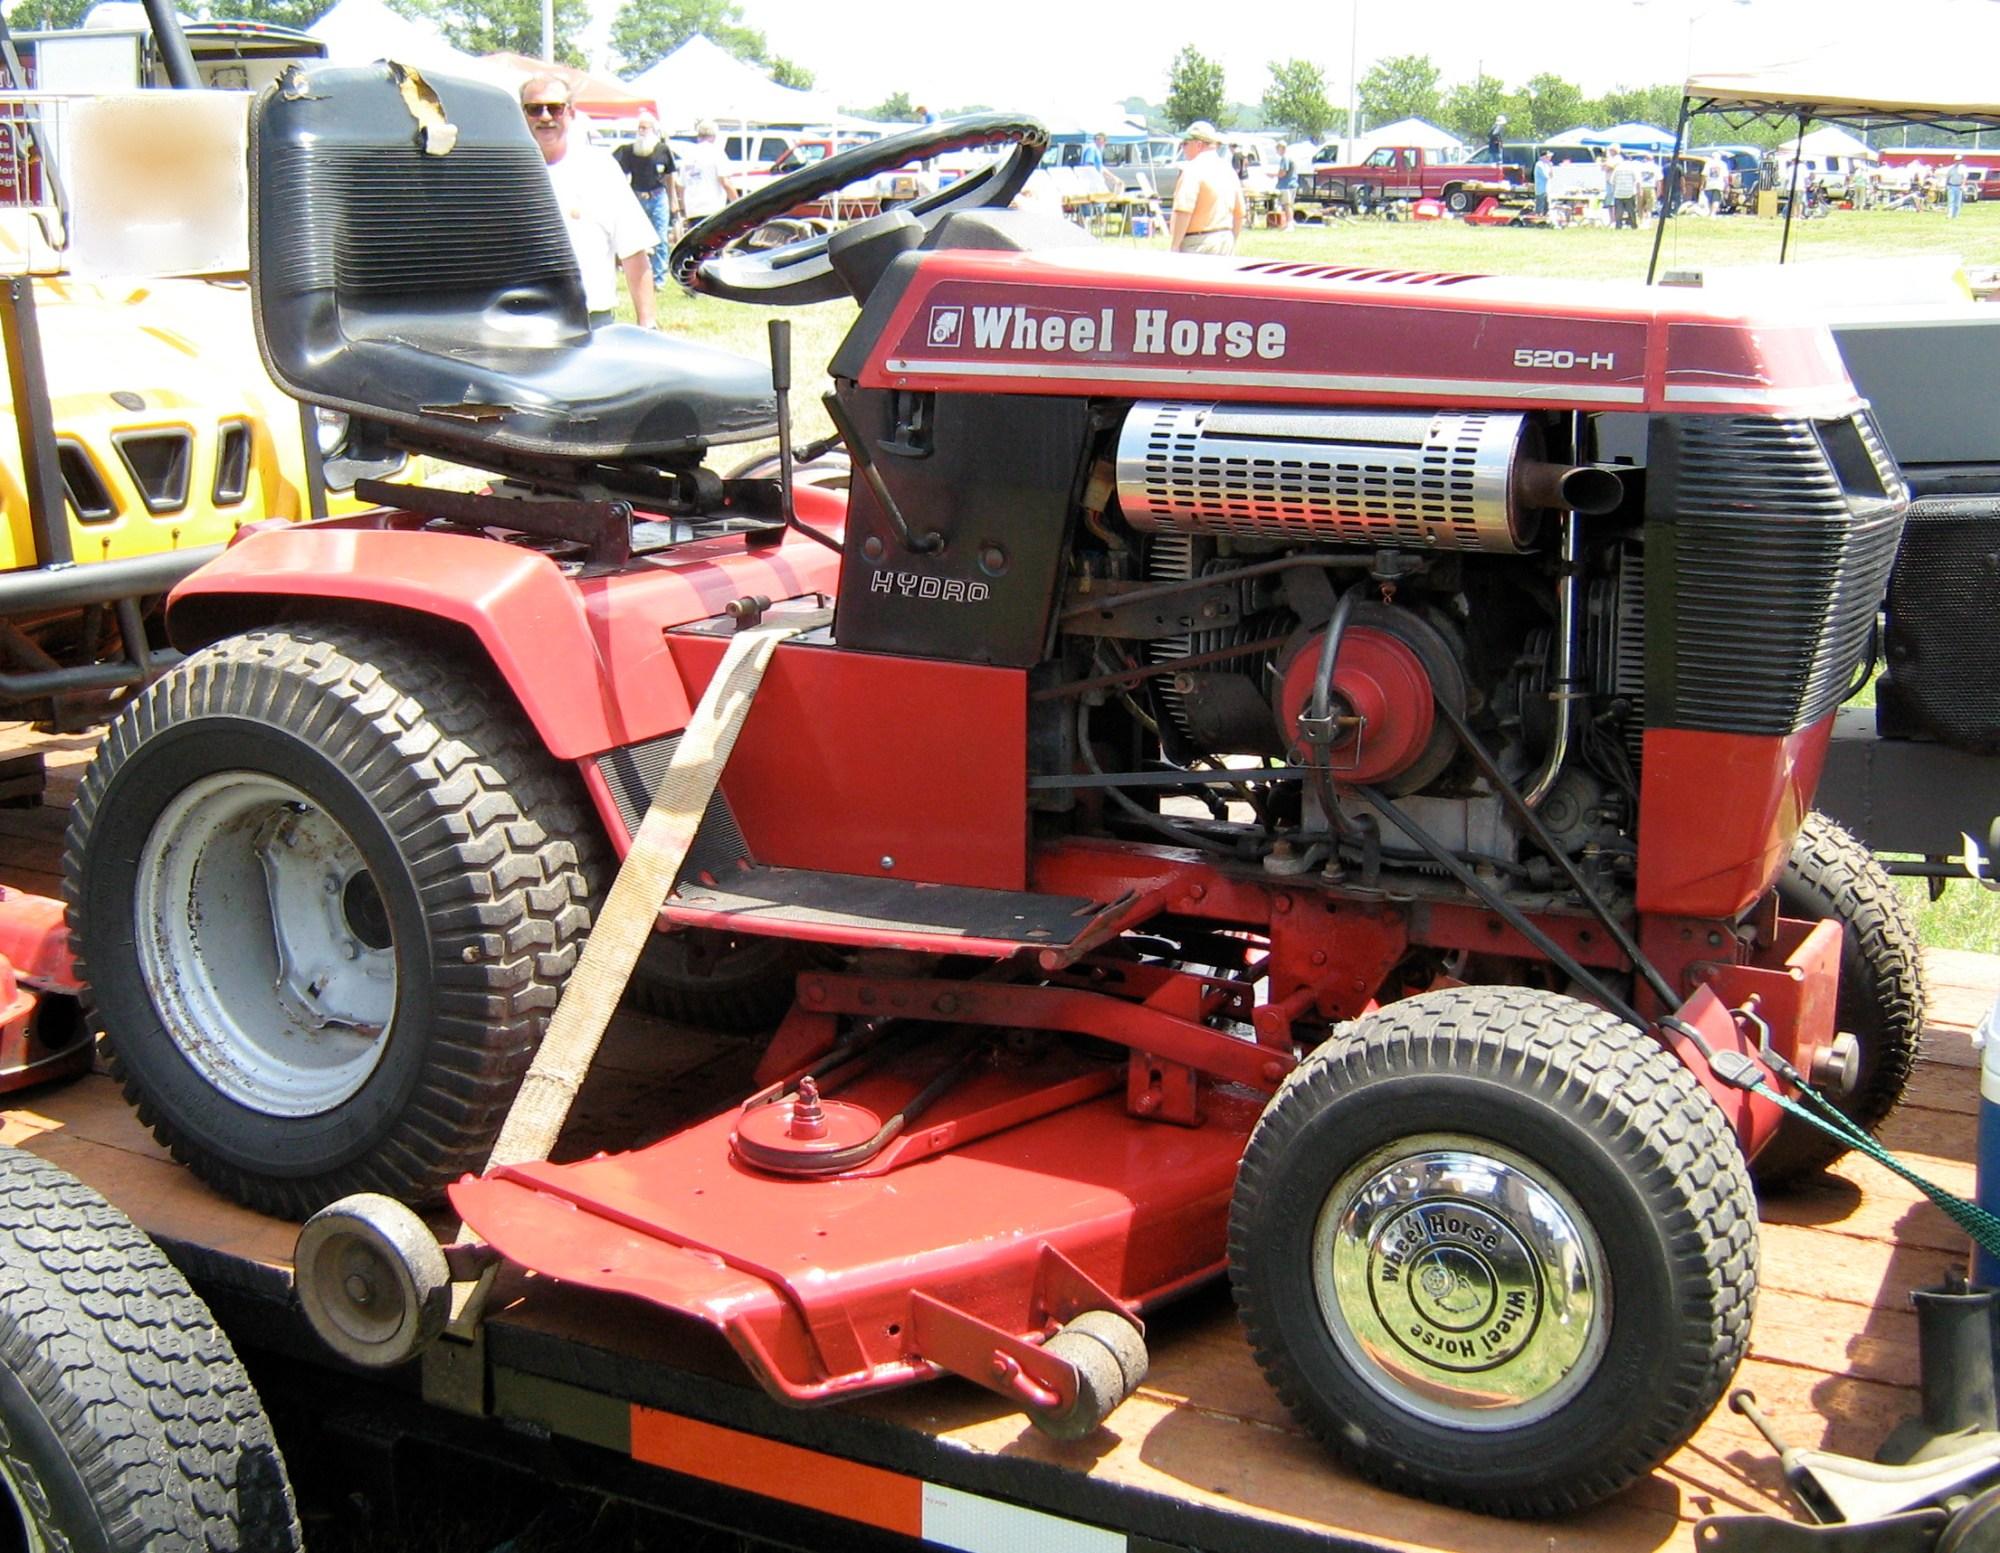 hight resolution of file 1986 wheel horse 520 h garden tractor s jpg